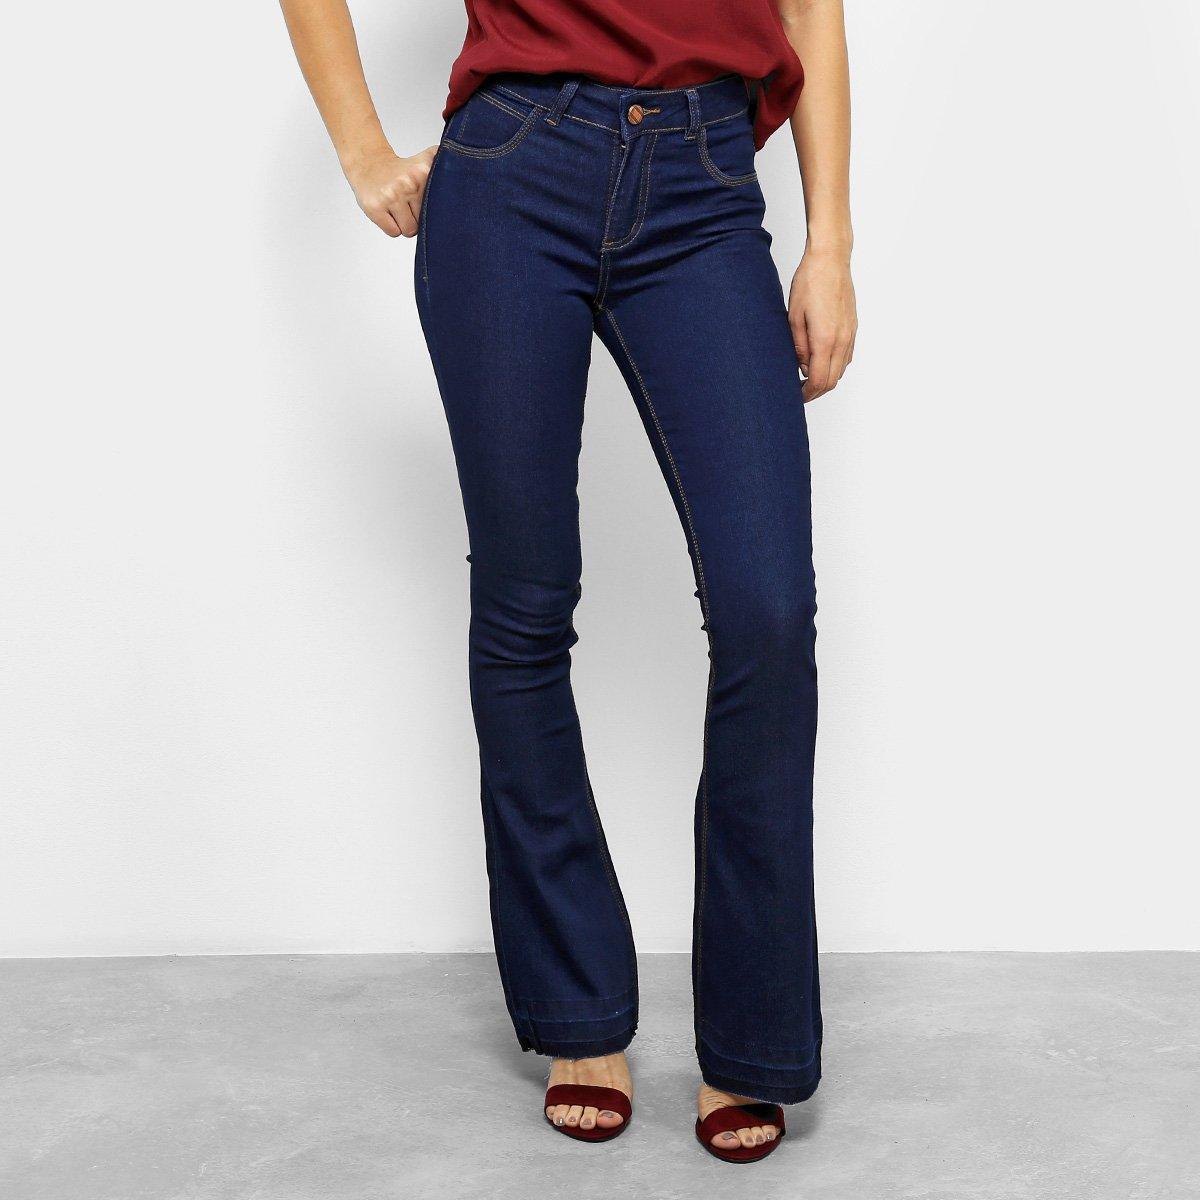 14ec225bb Calça Jeans Flare Coffee Cintura Média Feminina | Zattini